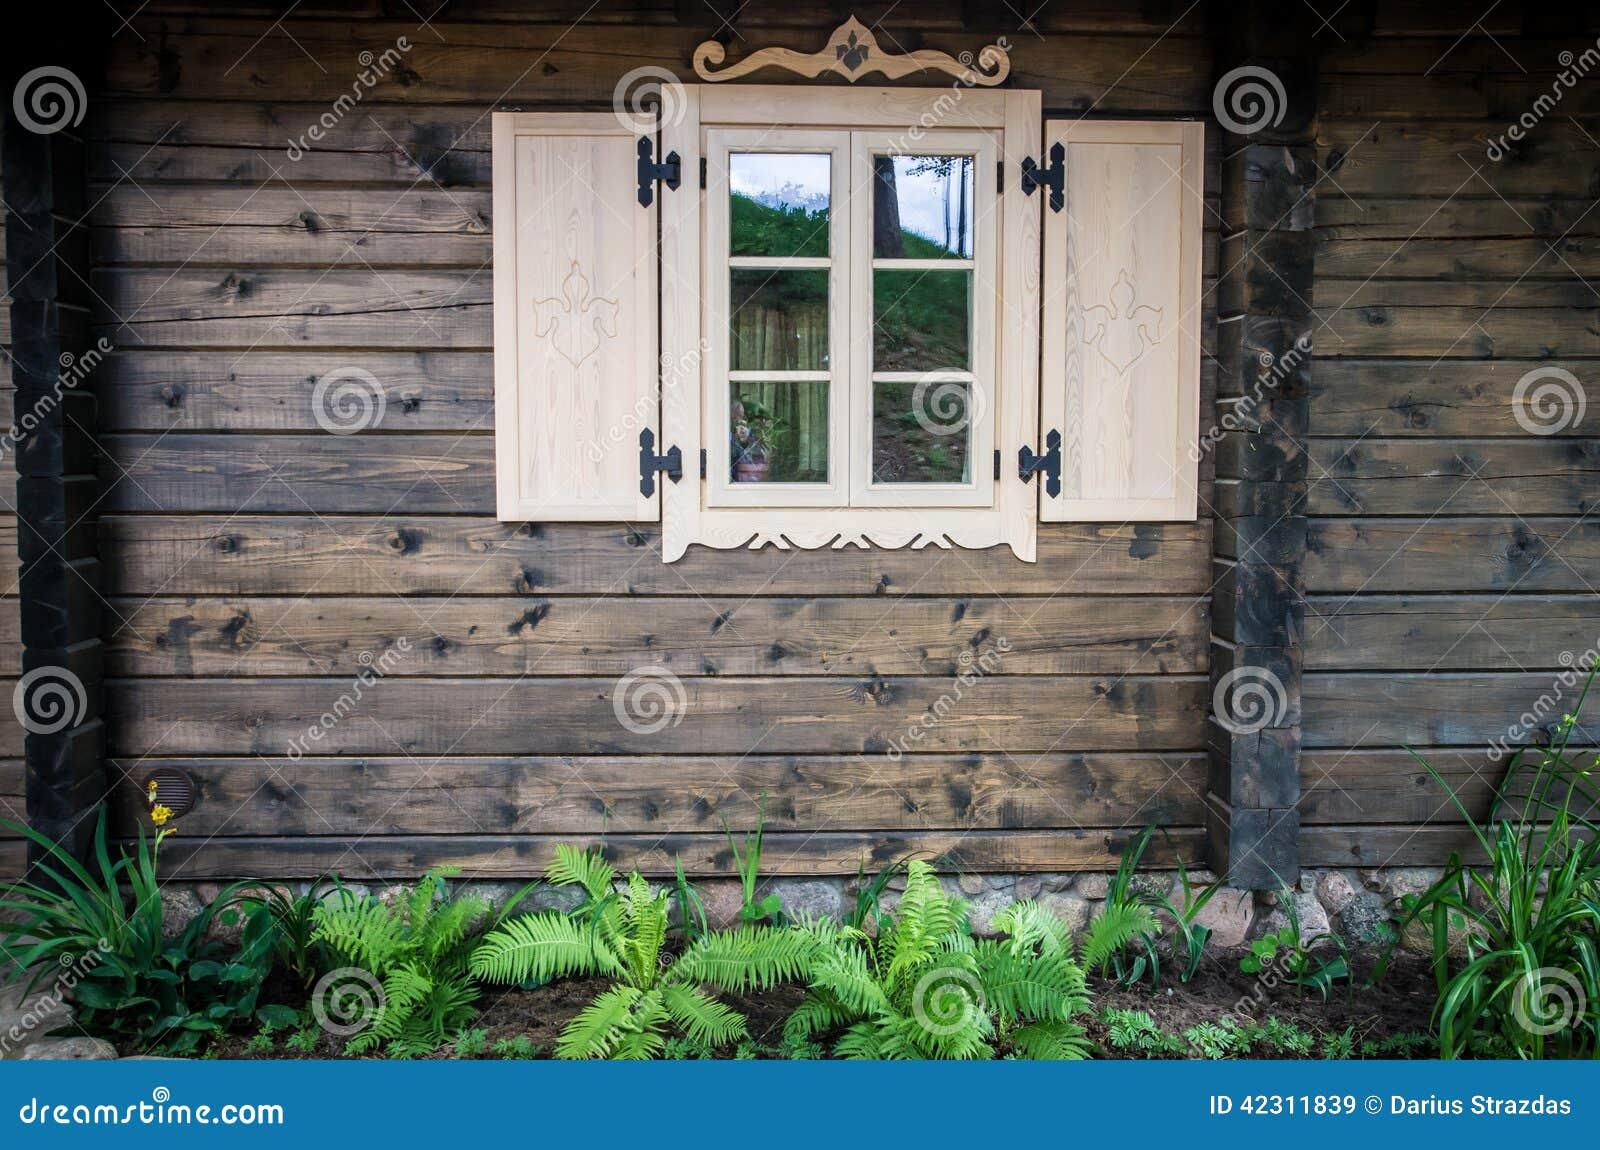 horndean winchester windows window casement cottage timber